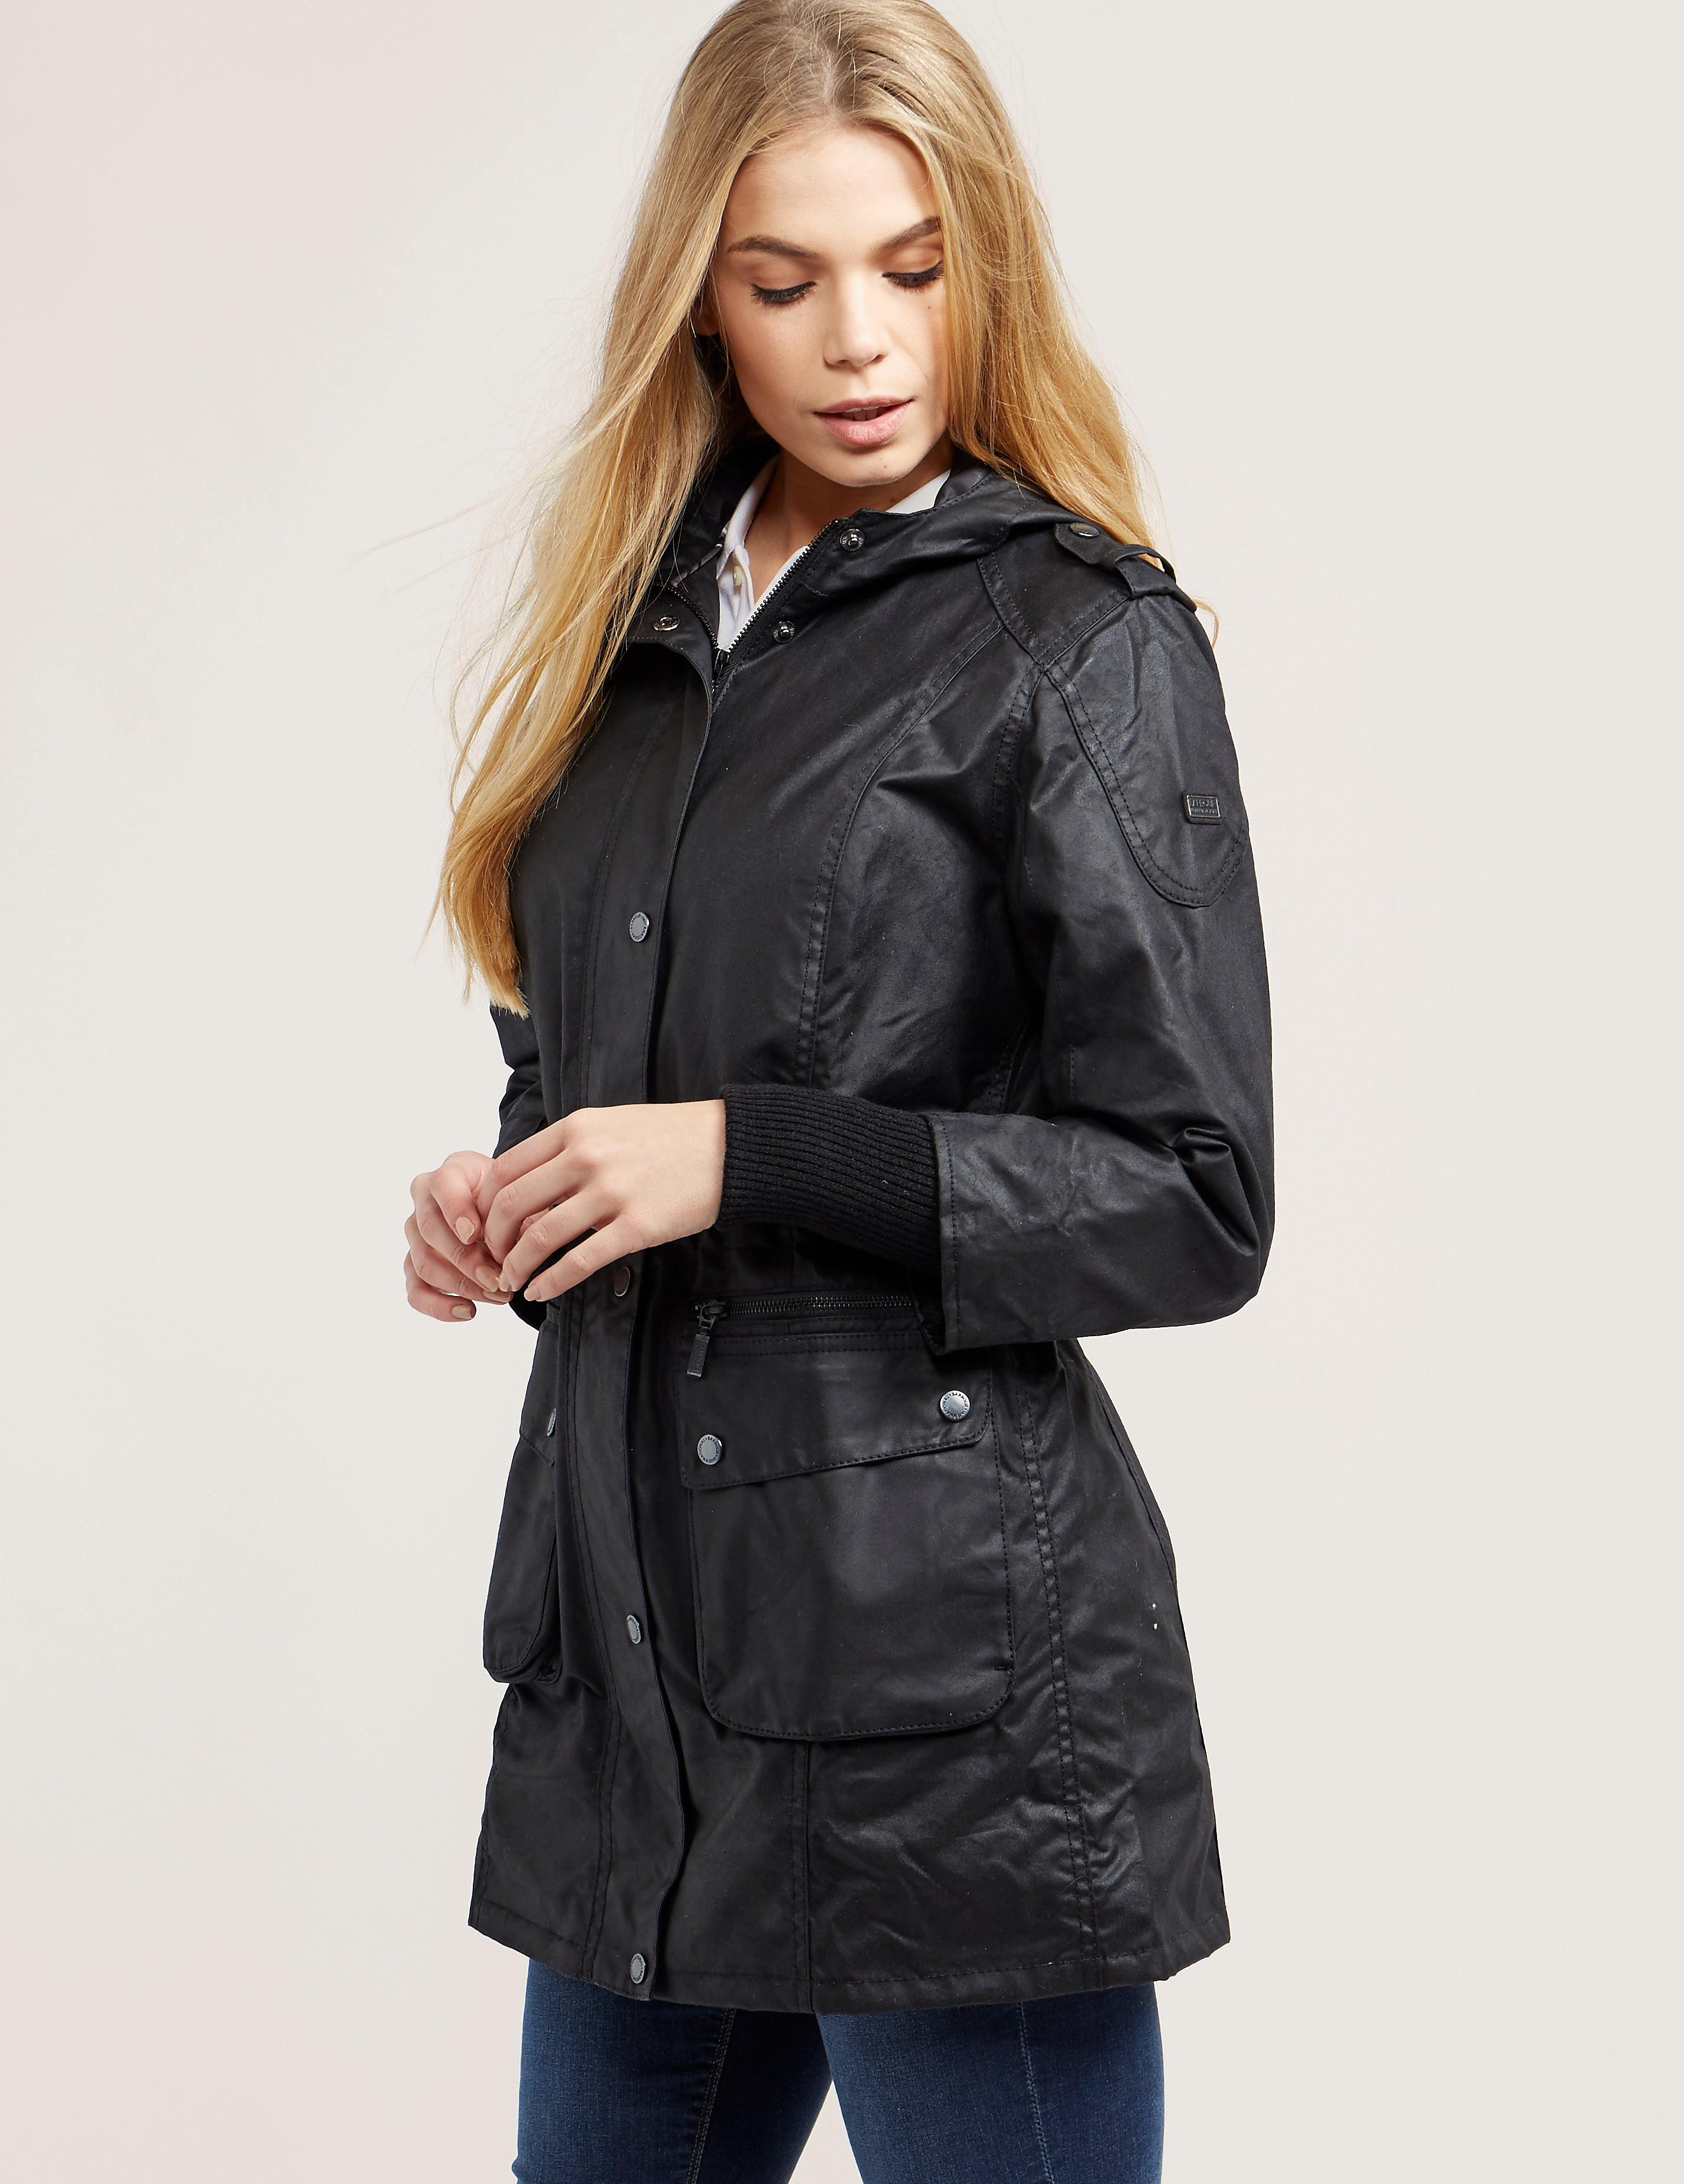 Barbour International Riser Wax Parka Jacket